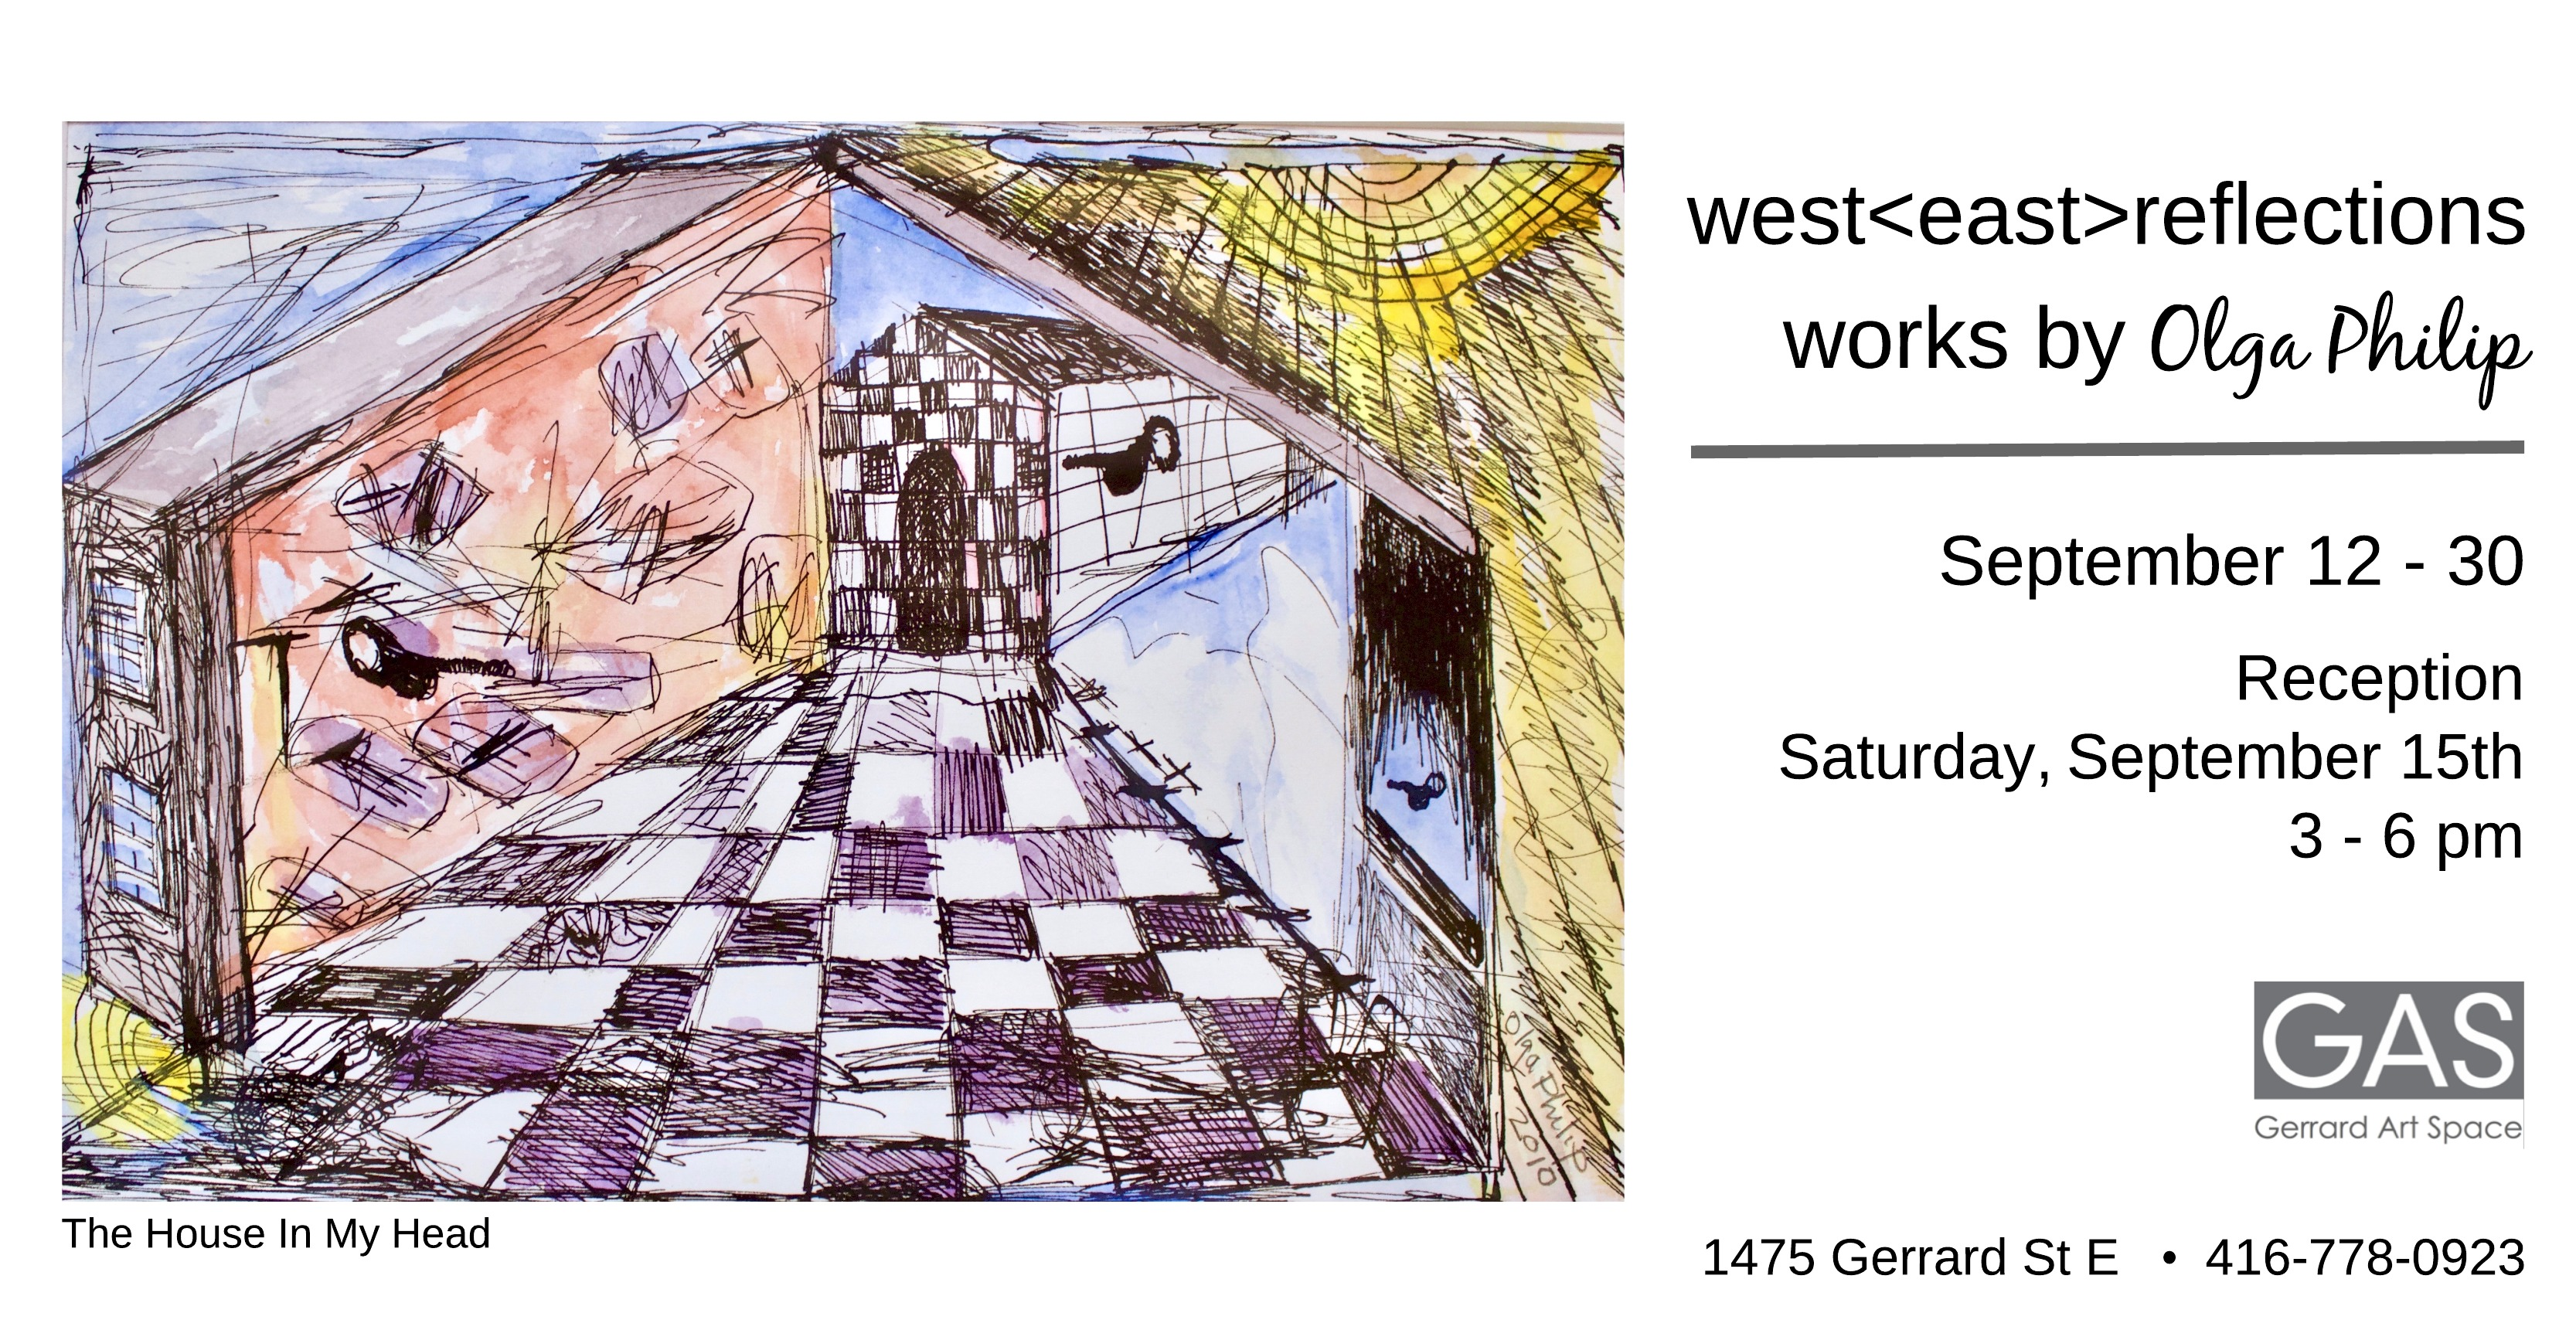 Olga Philip: west<east>reflections